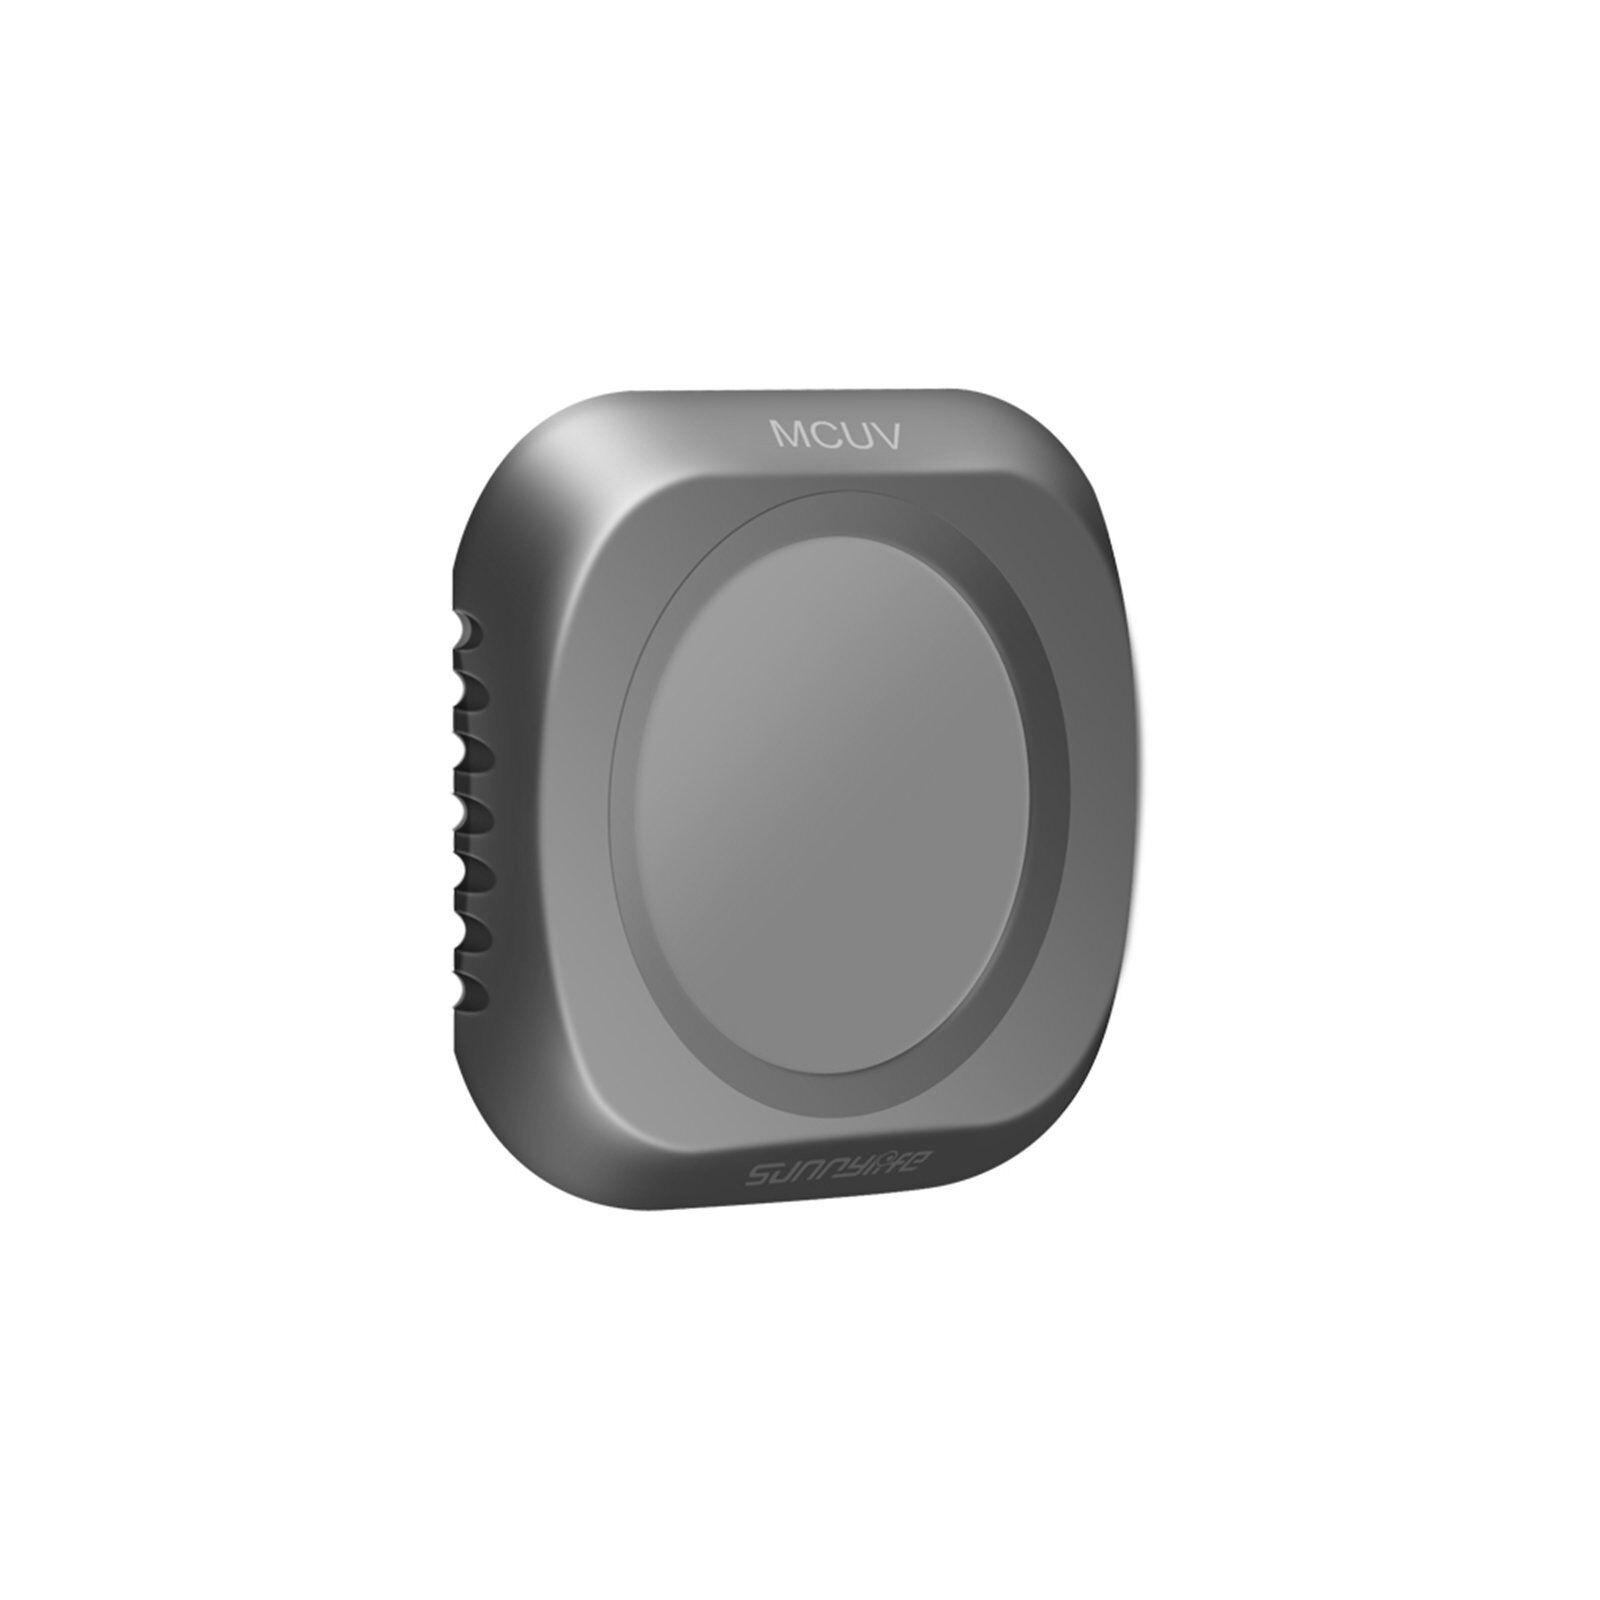 Teletelecamera Lens Lens Lens Obiettivo Filtro nd4 nd8 nd16 nd32 MCUV CPL PER DJI Mavic 2 Pro Drone b4cfa3